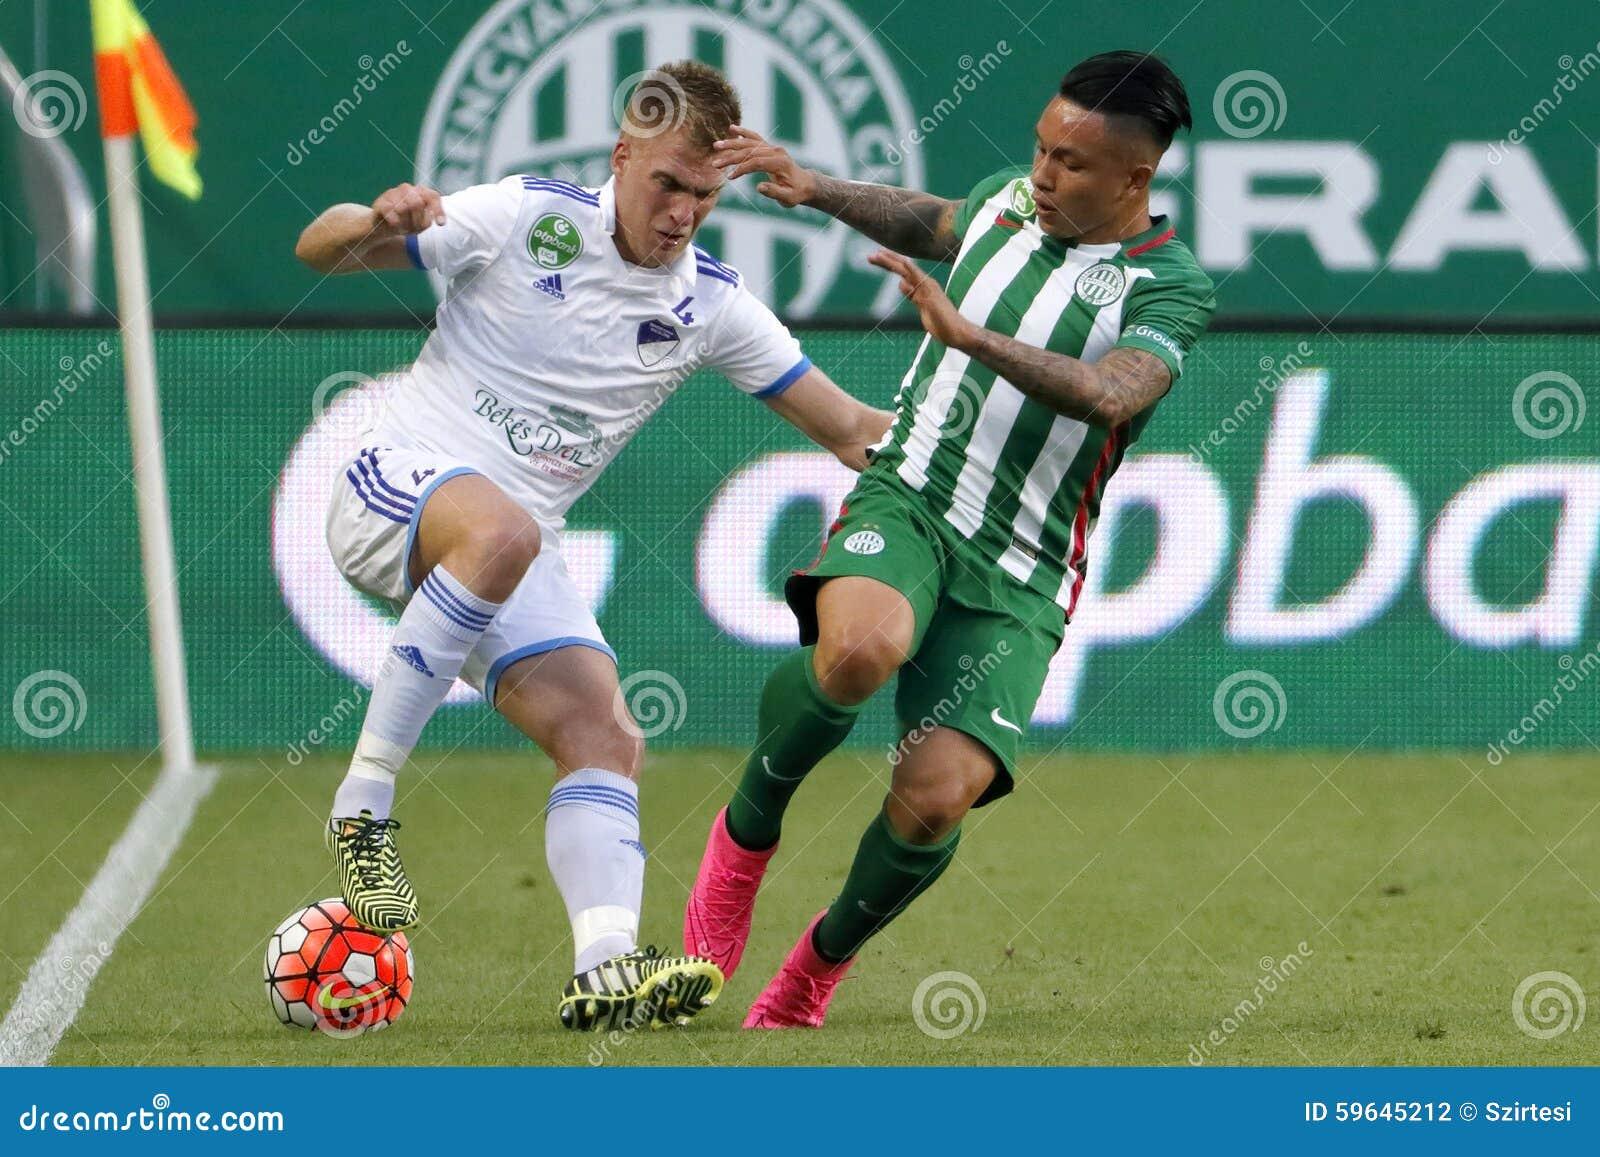 Ferencvaros Vs Bekescsaba Otp Bank League Football Match